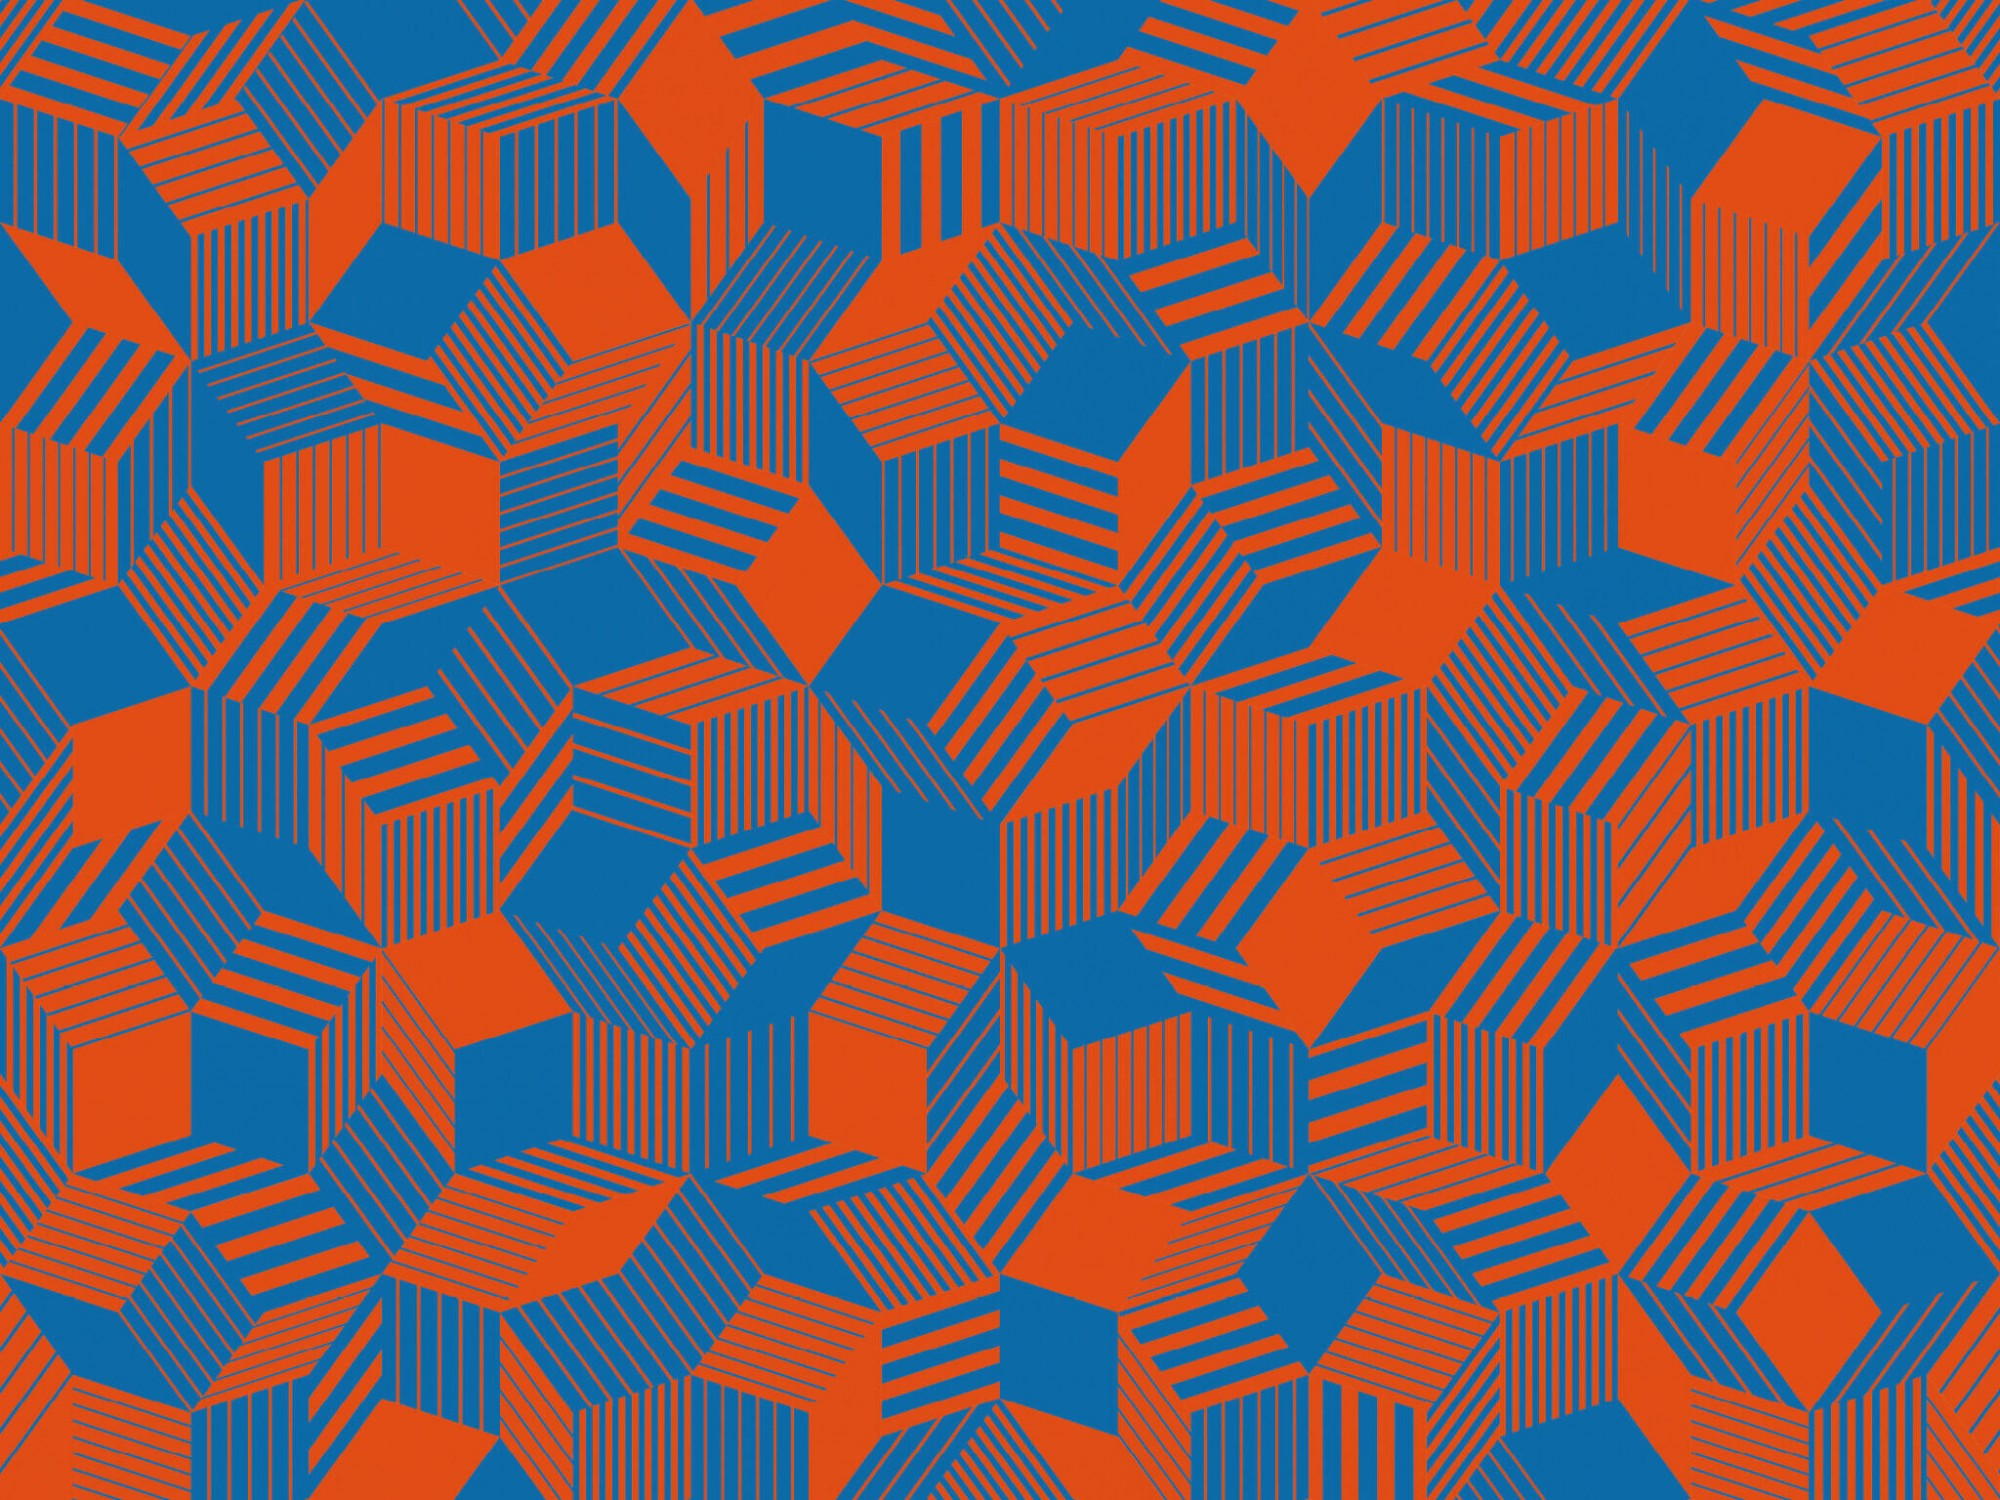 Zoom du papier peint motif géométrique penrose, Penrose Liechtenstein, collection Penrose, design IchetKar